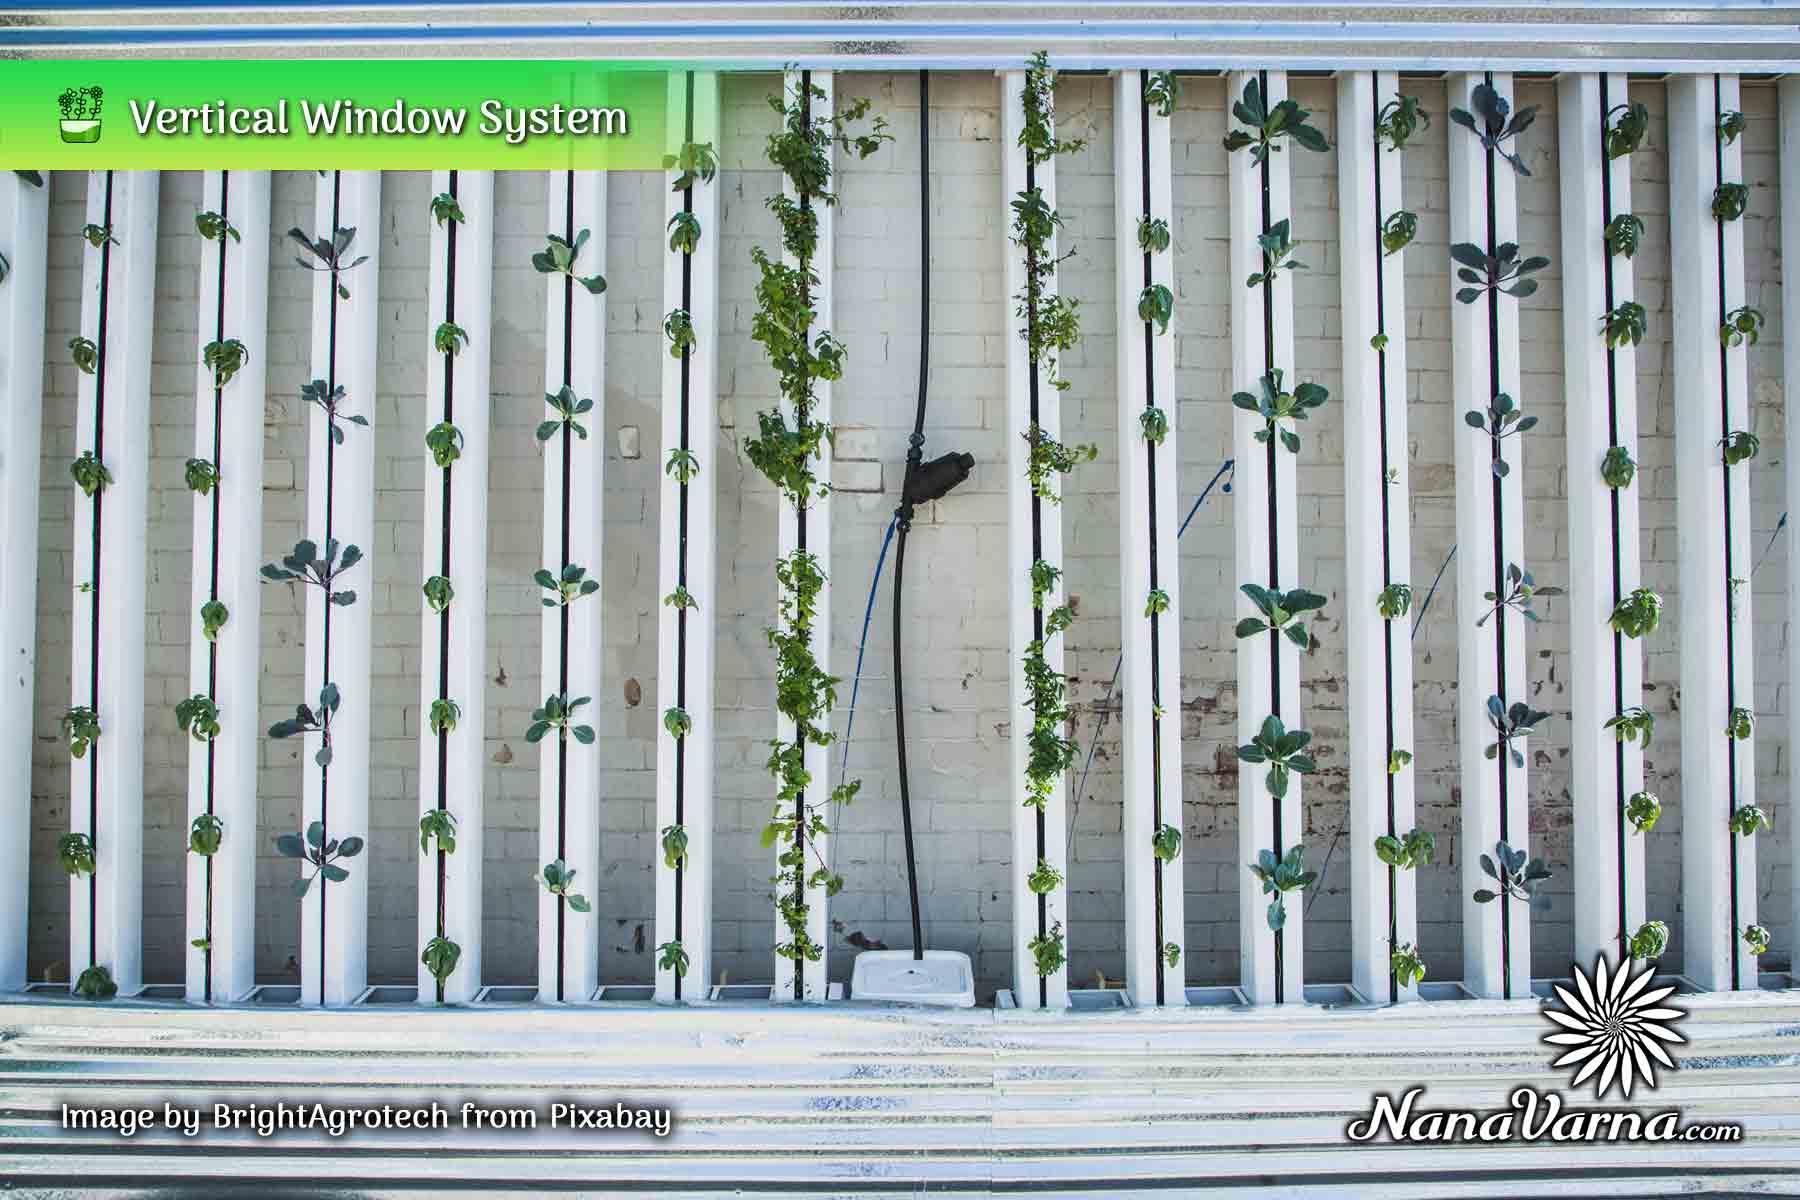 hydroponic garden system 07